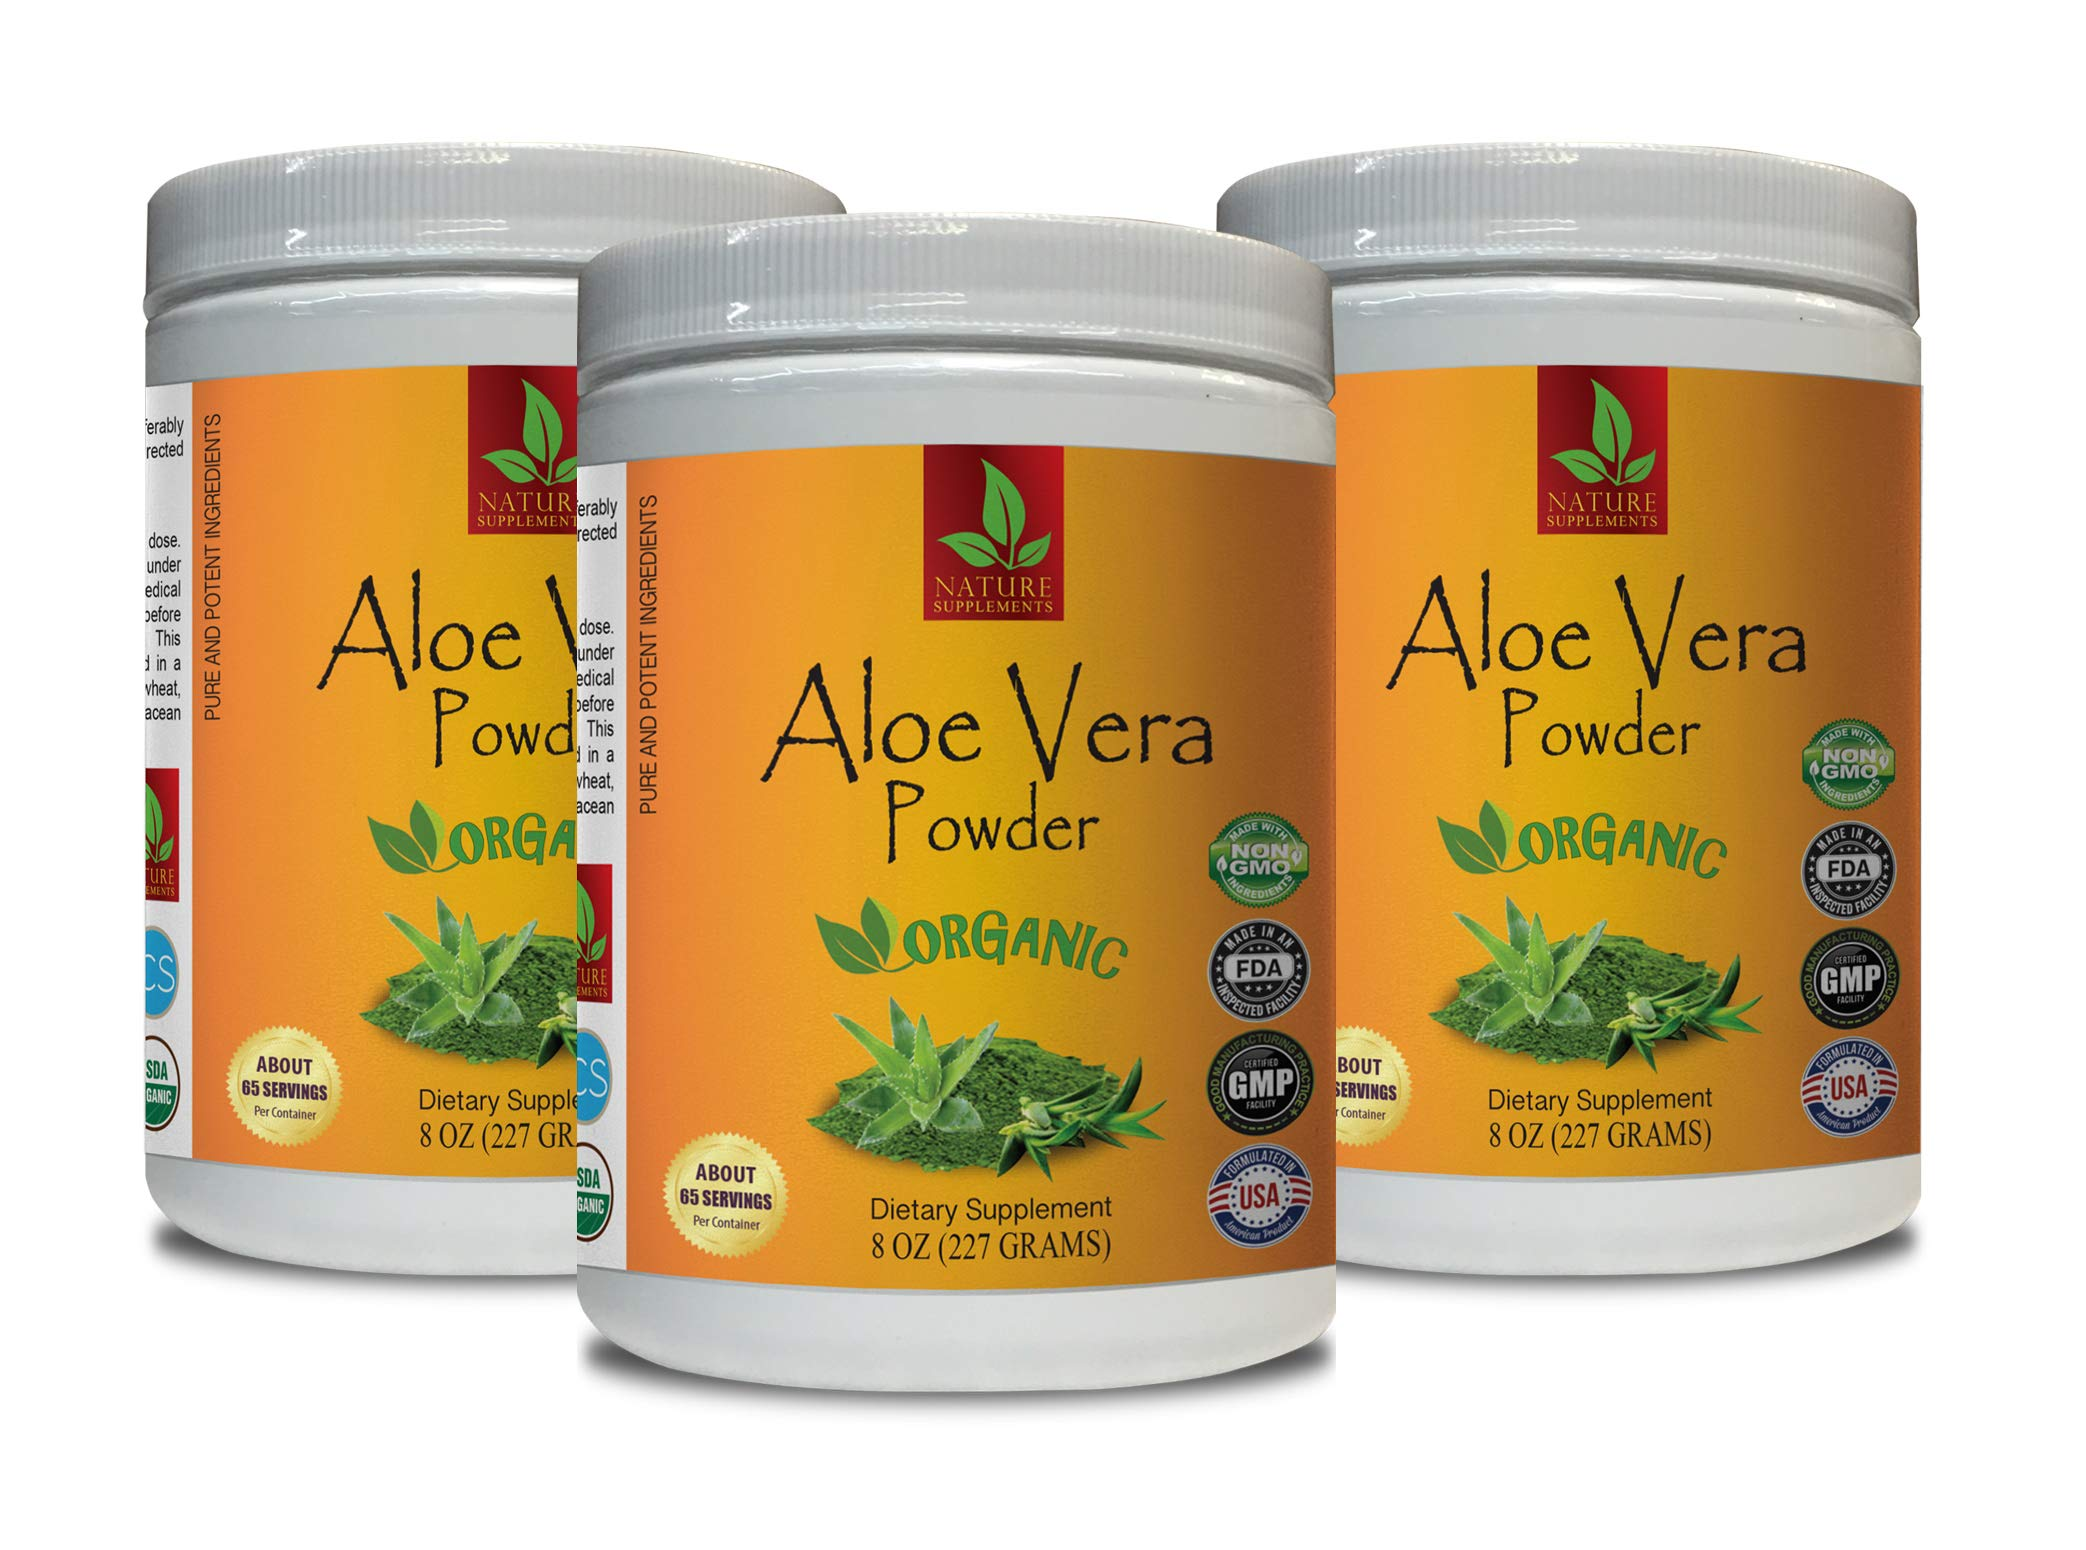 Organic Immune Boosting Supplements - Aloe Vera Organic Powder - Pure and Potent Ingredients - Aloe Vera Vitamins - 3 Cans 24 OZ (195 Servings)